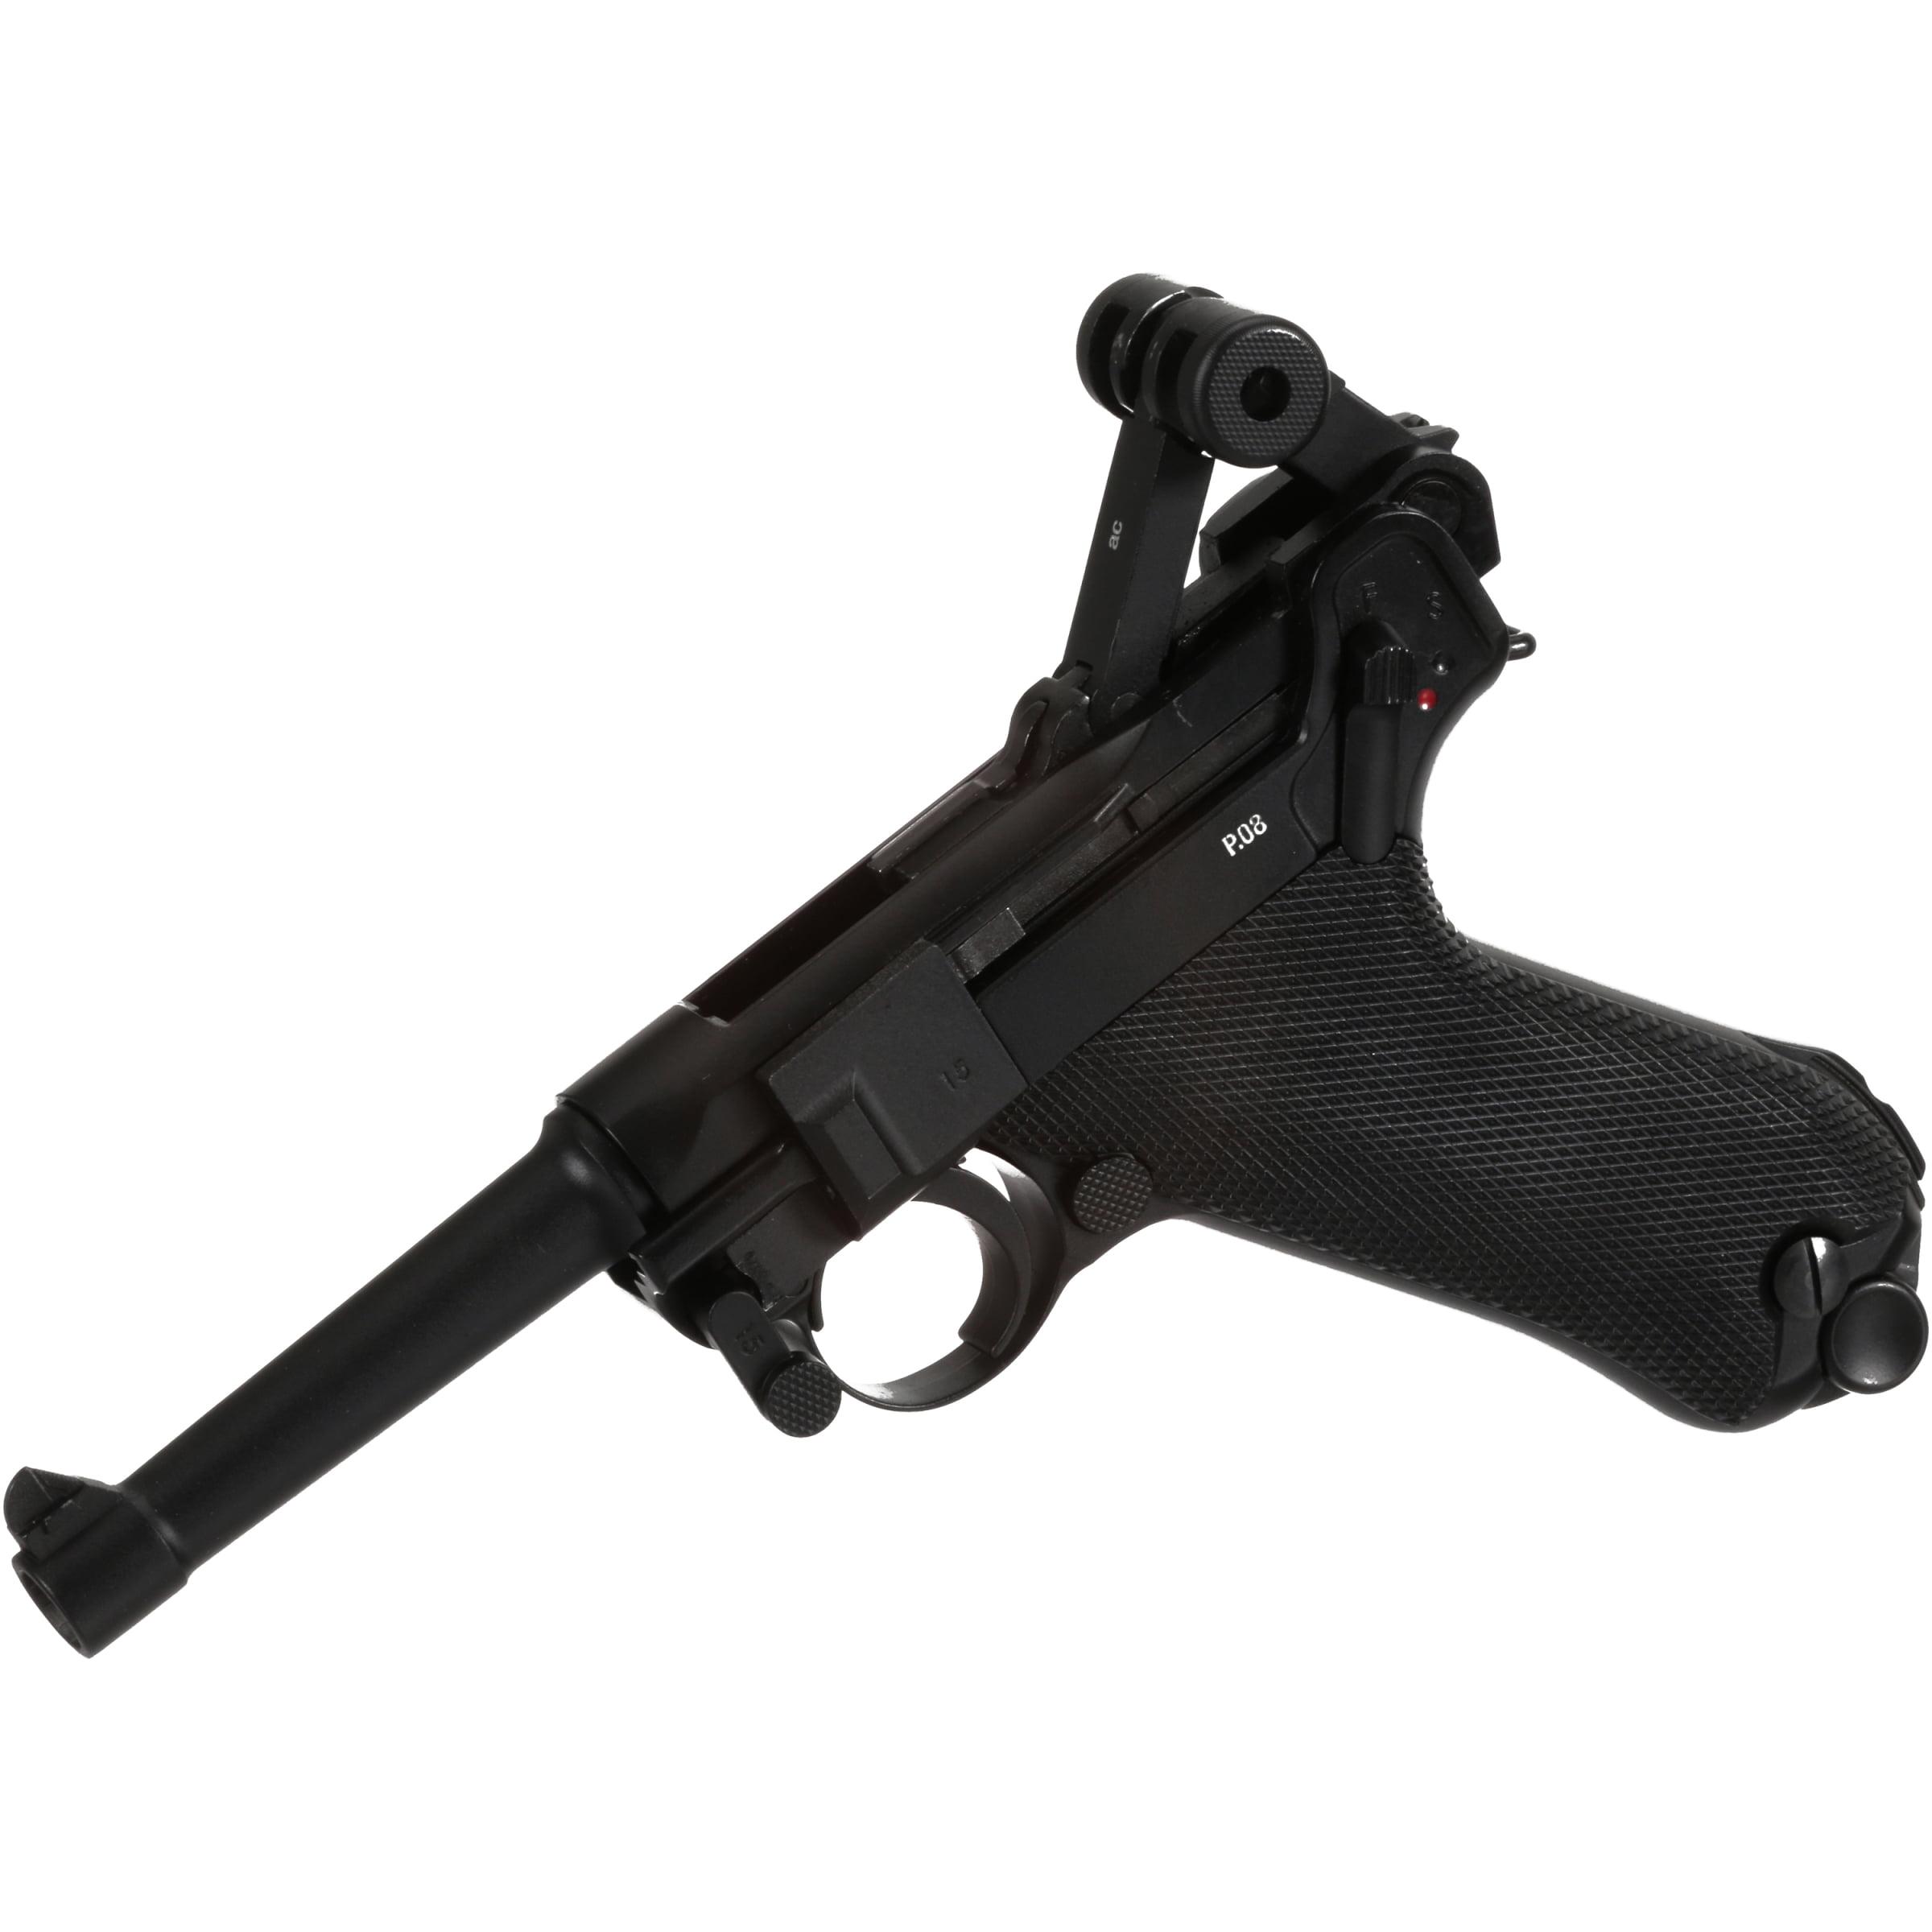 Legends P.08 Blowback 2251803 BB Air Pistol w Fixed Sights by UMAREX USA, Inc.